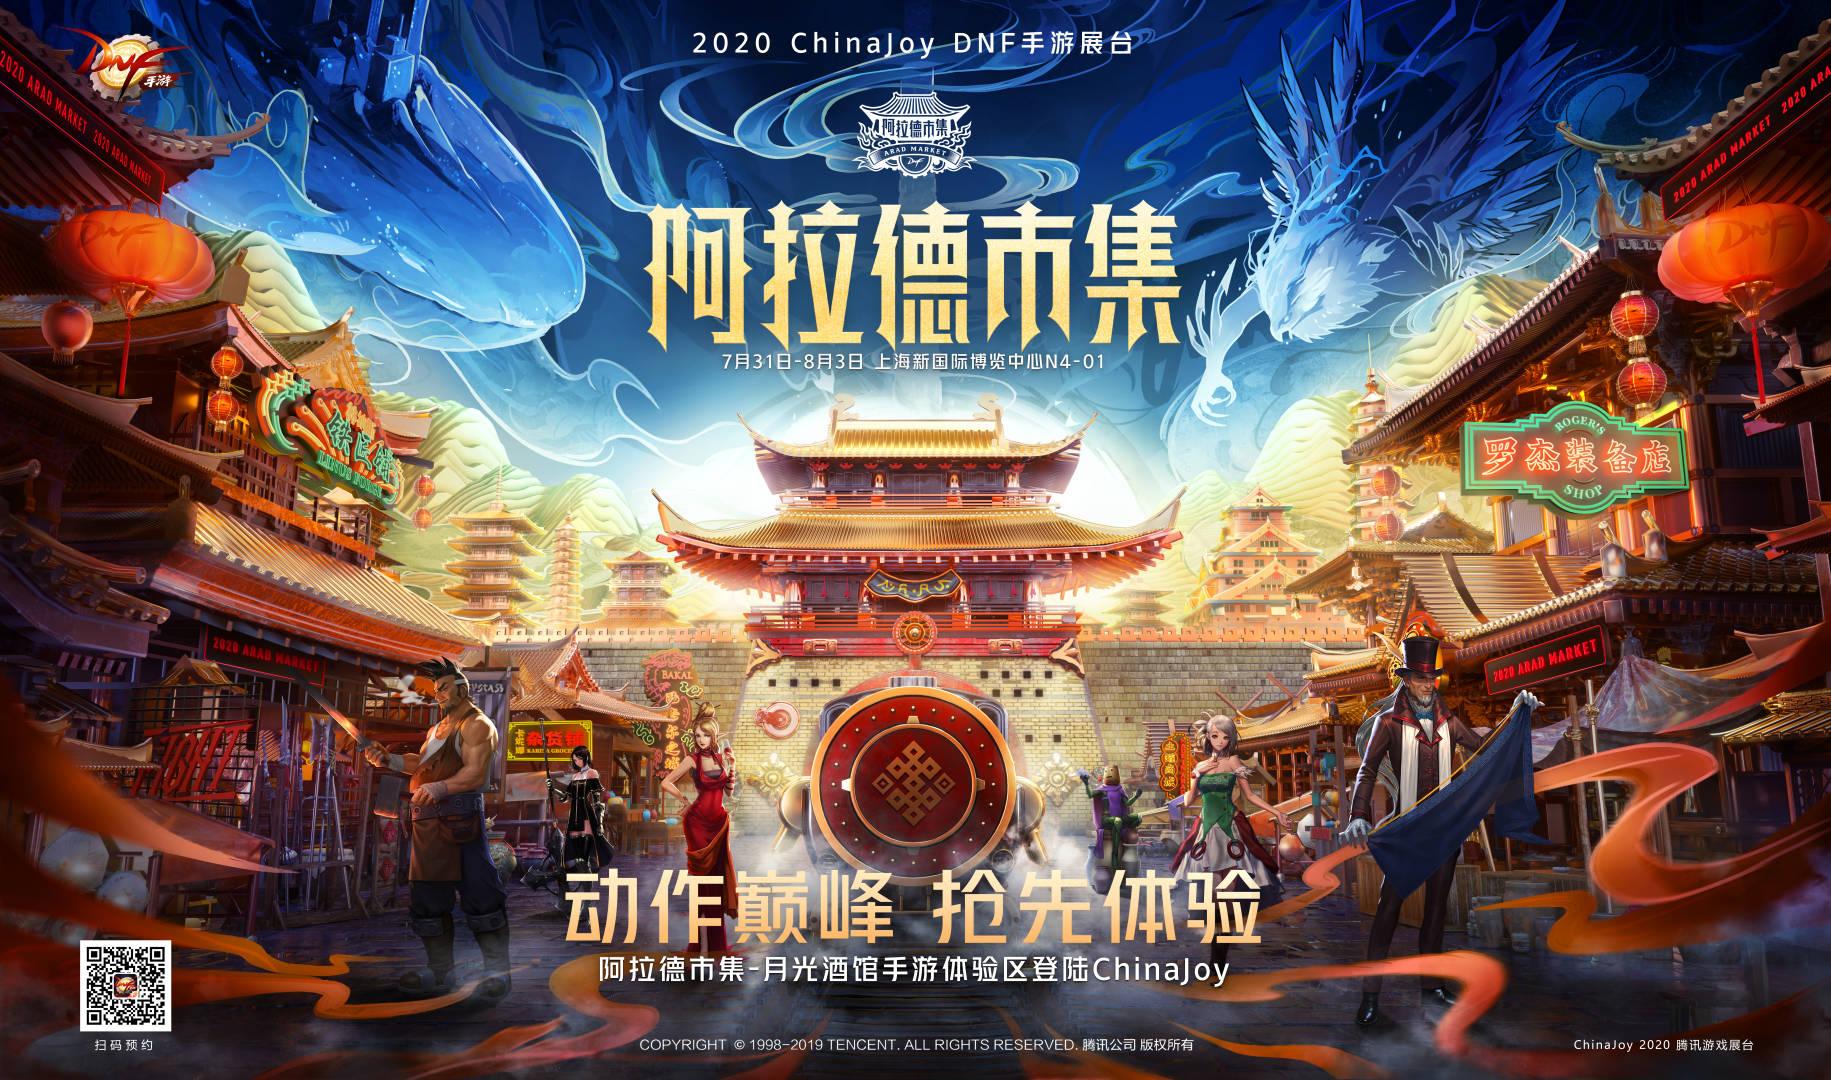 DNF手游亮相2020ChinaJoy  8月12日热血上线2020ChinaJoy